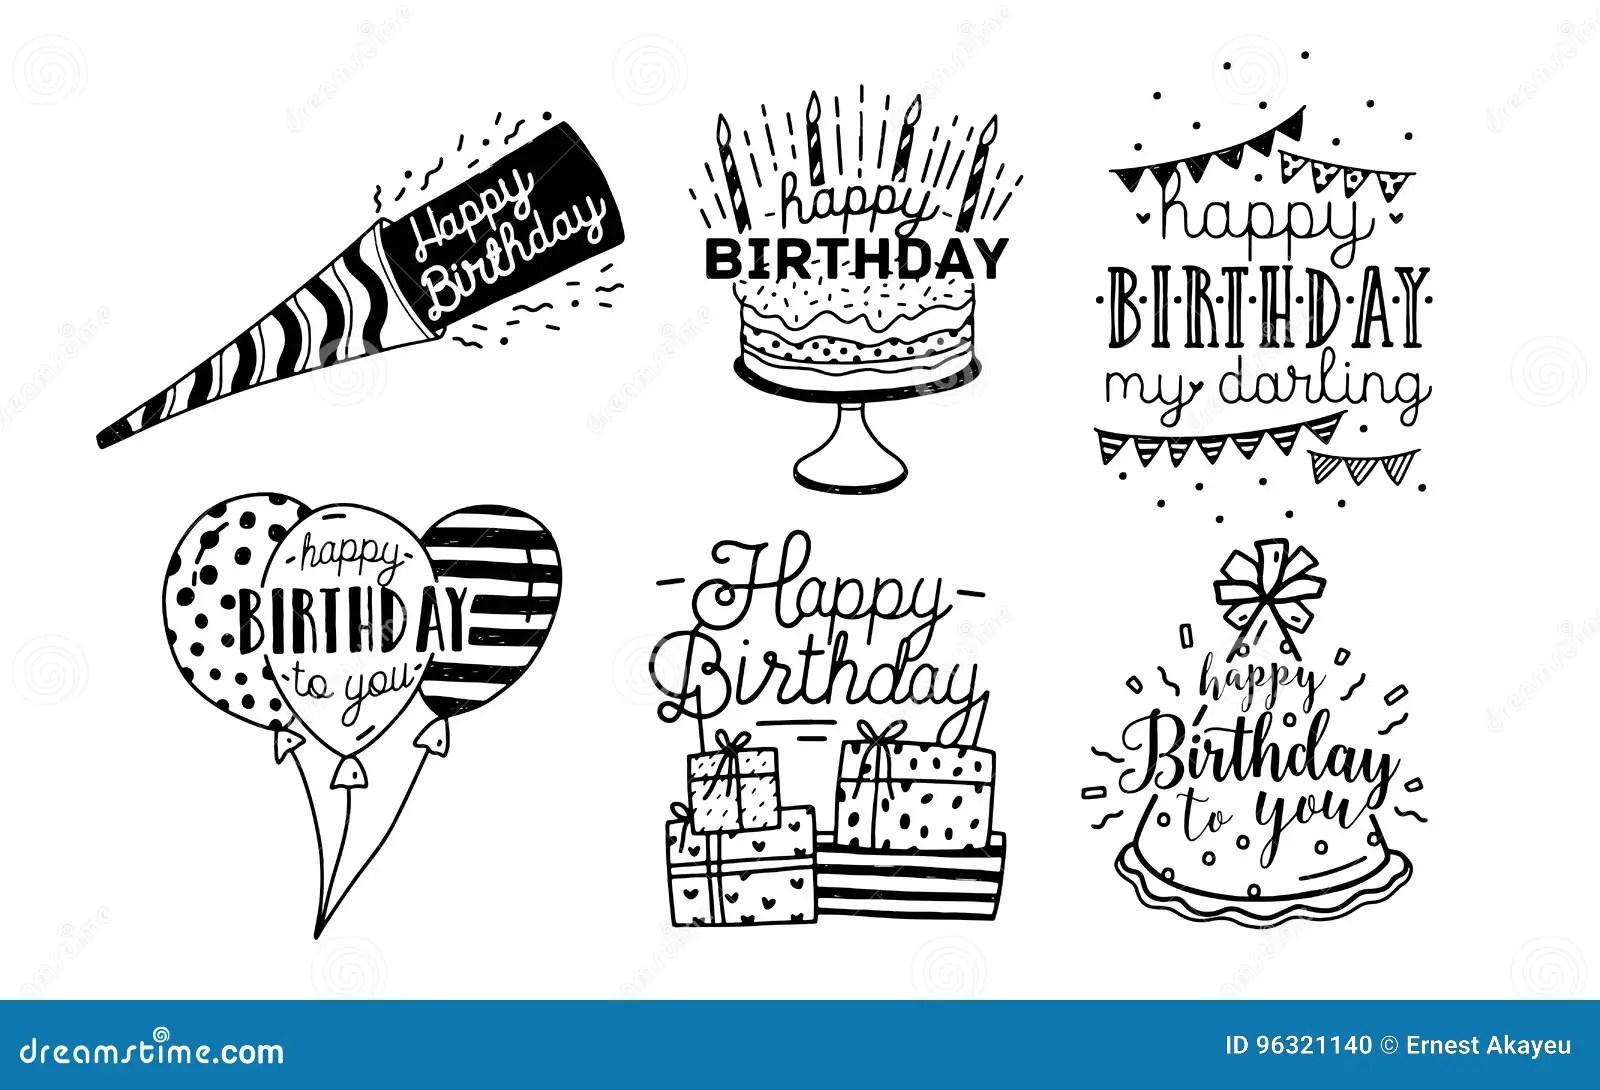 Cute Happy Birthday Greetings Inscriptions Design